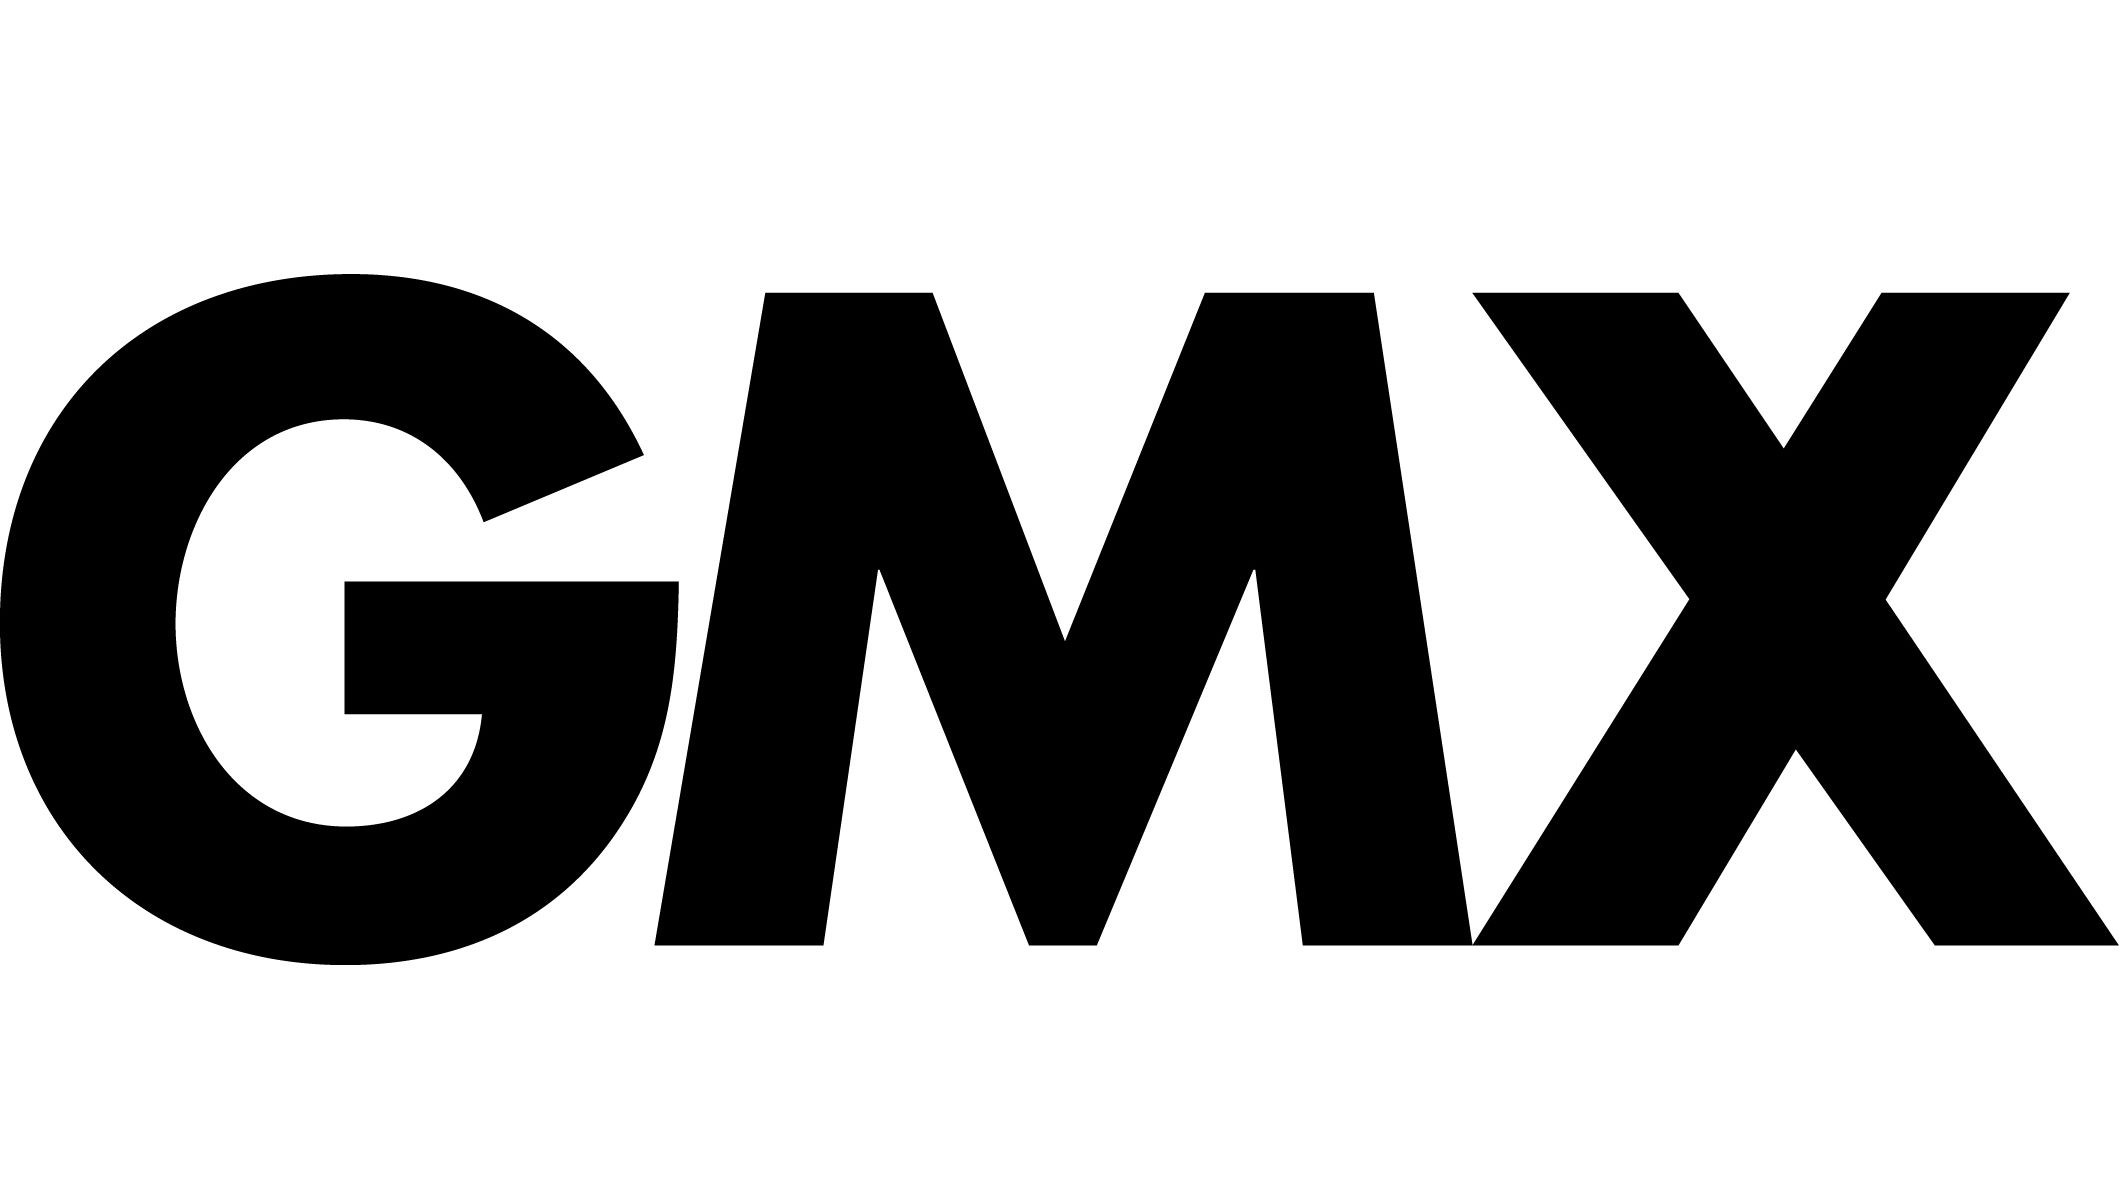 Gmx Login 24